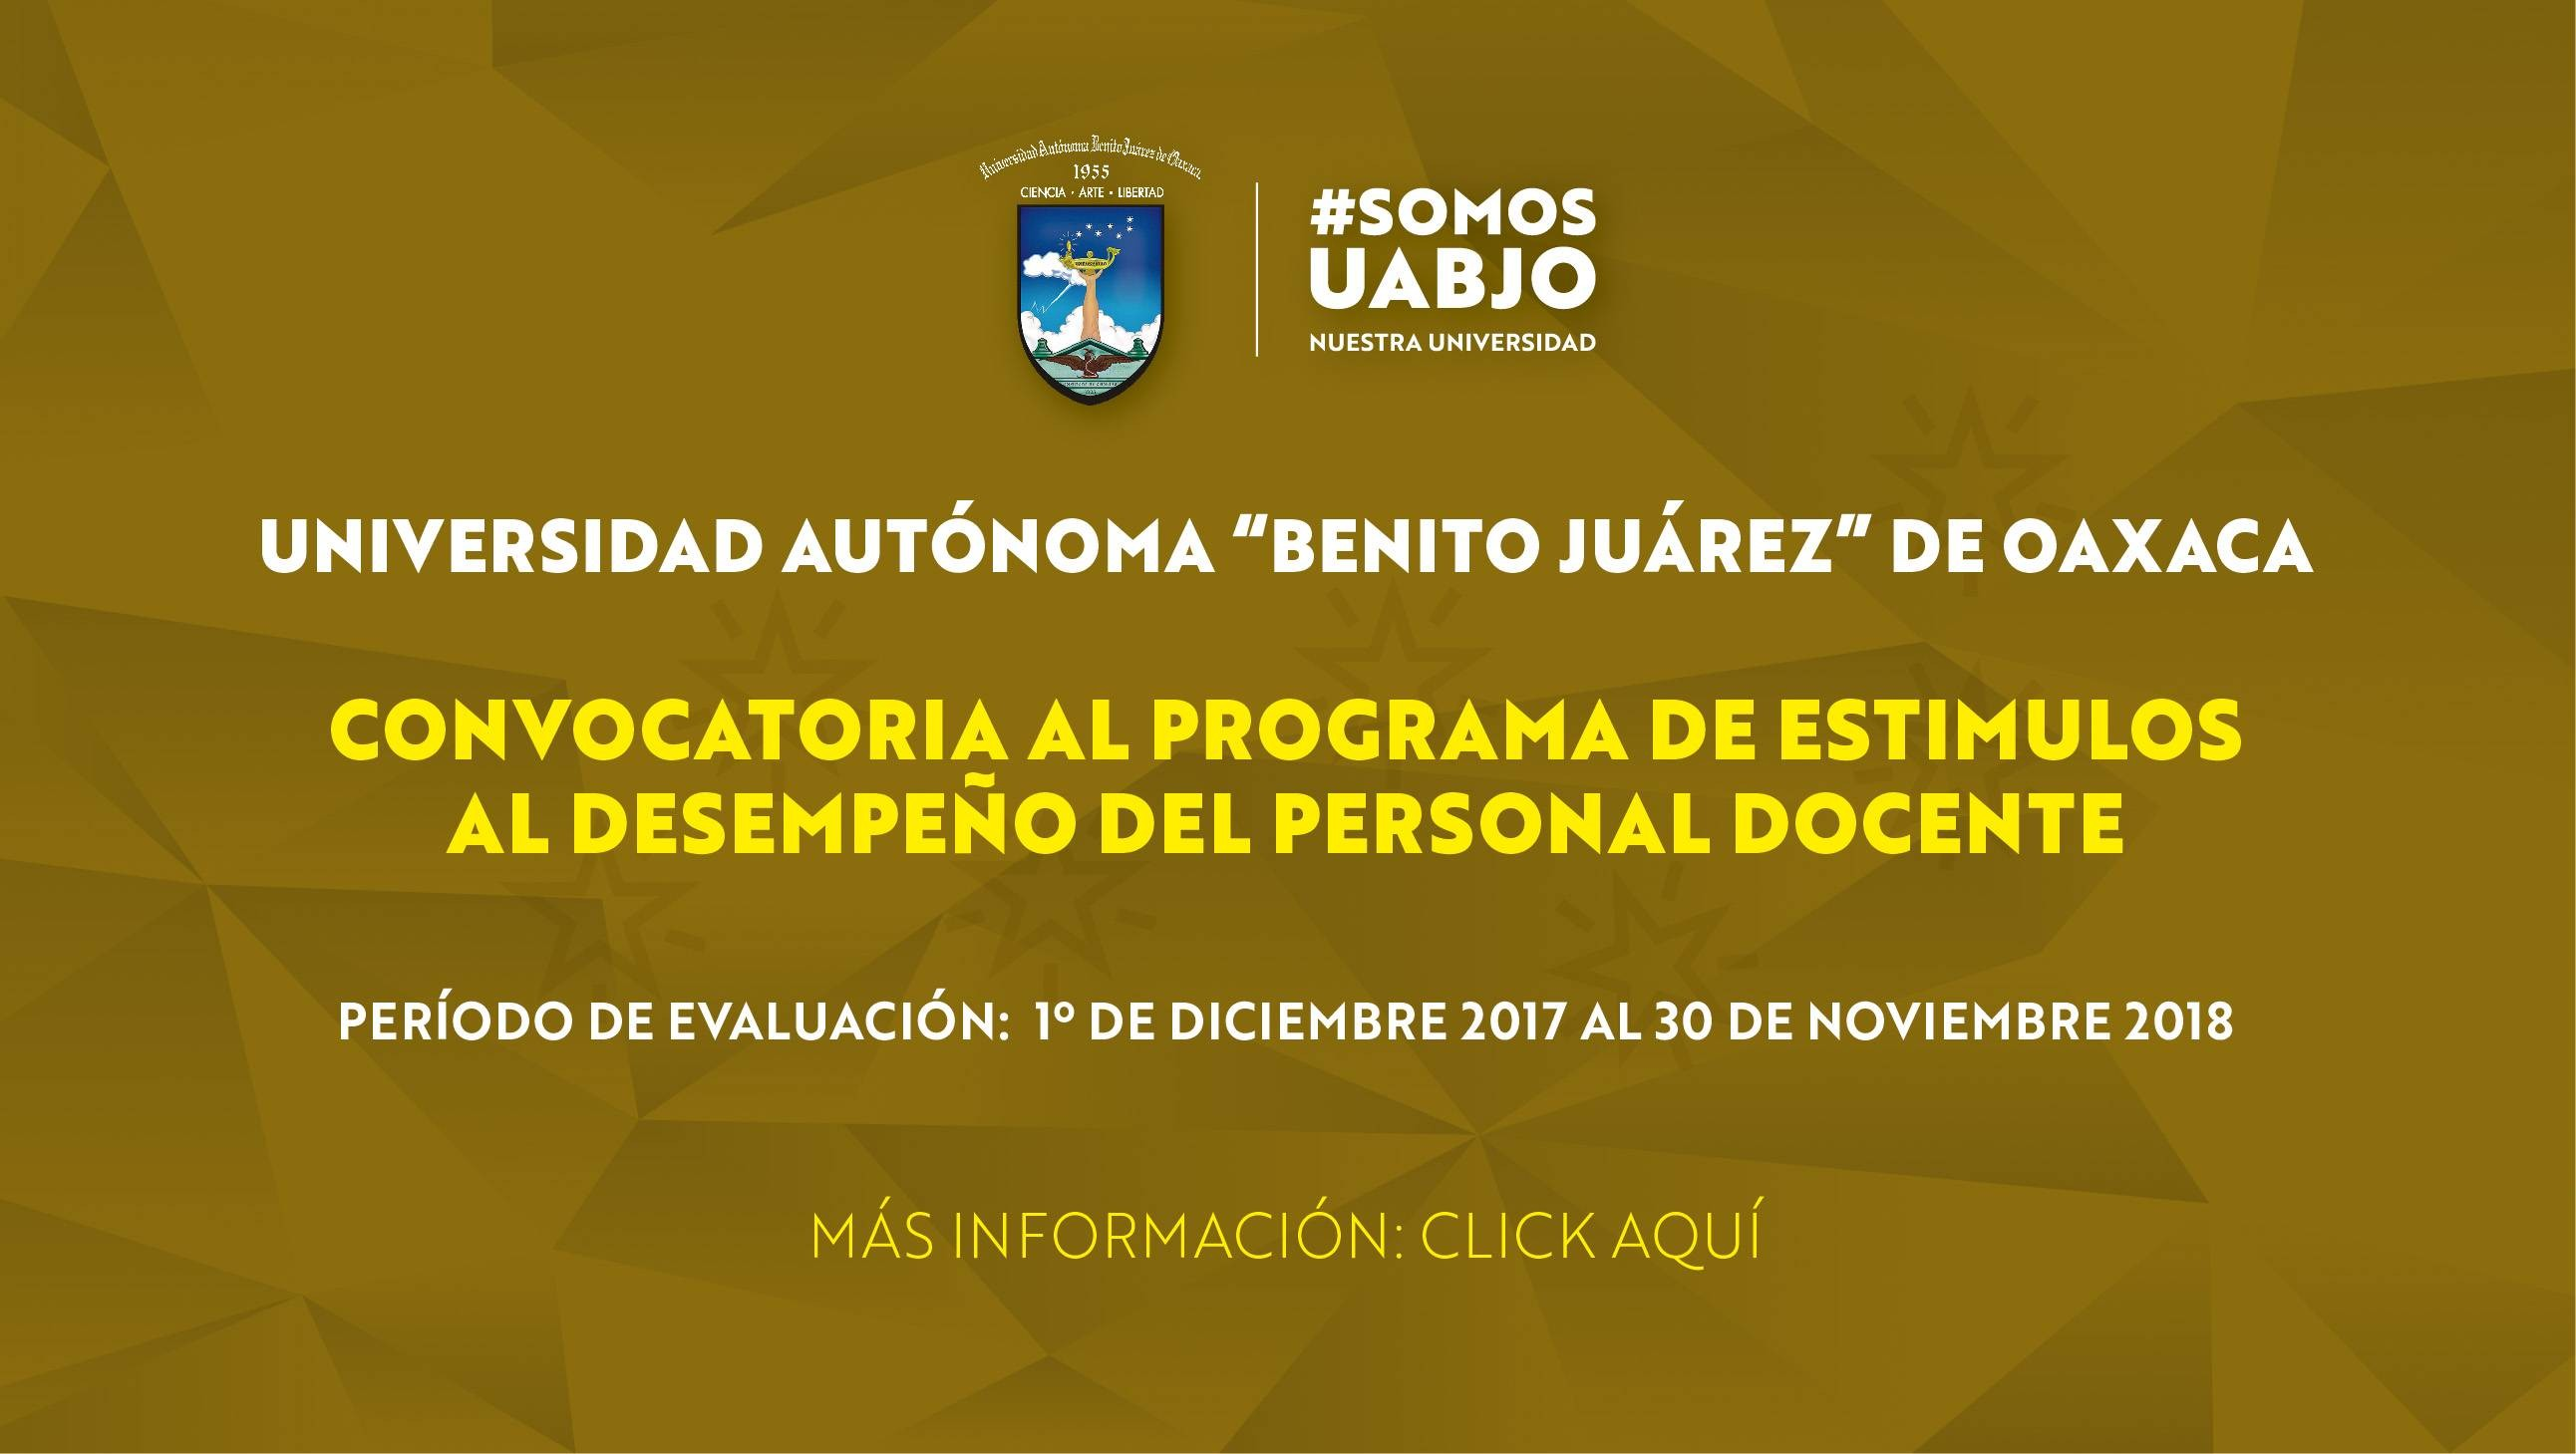 Calendario 2019 Escolar Secundaria Más Arriba-a-fecha Universidad Aut³noma Benito Juárez De Oaxaca Of Calendario 2019 Escolar Secundaria Recientes Impresionante 42 Ilustraci³n 1997 Calendario 2019